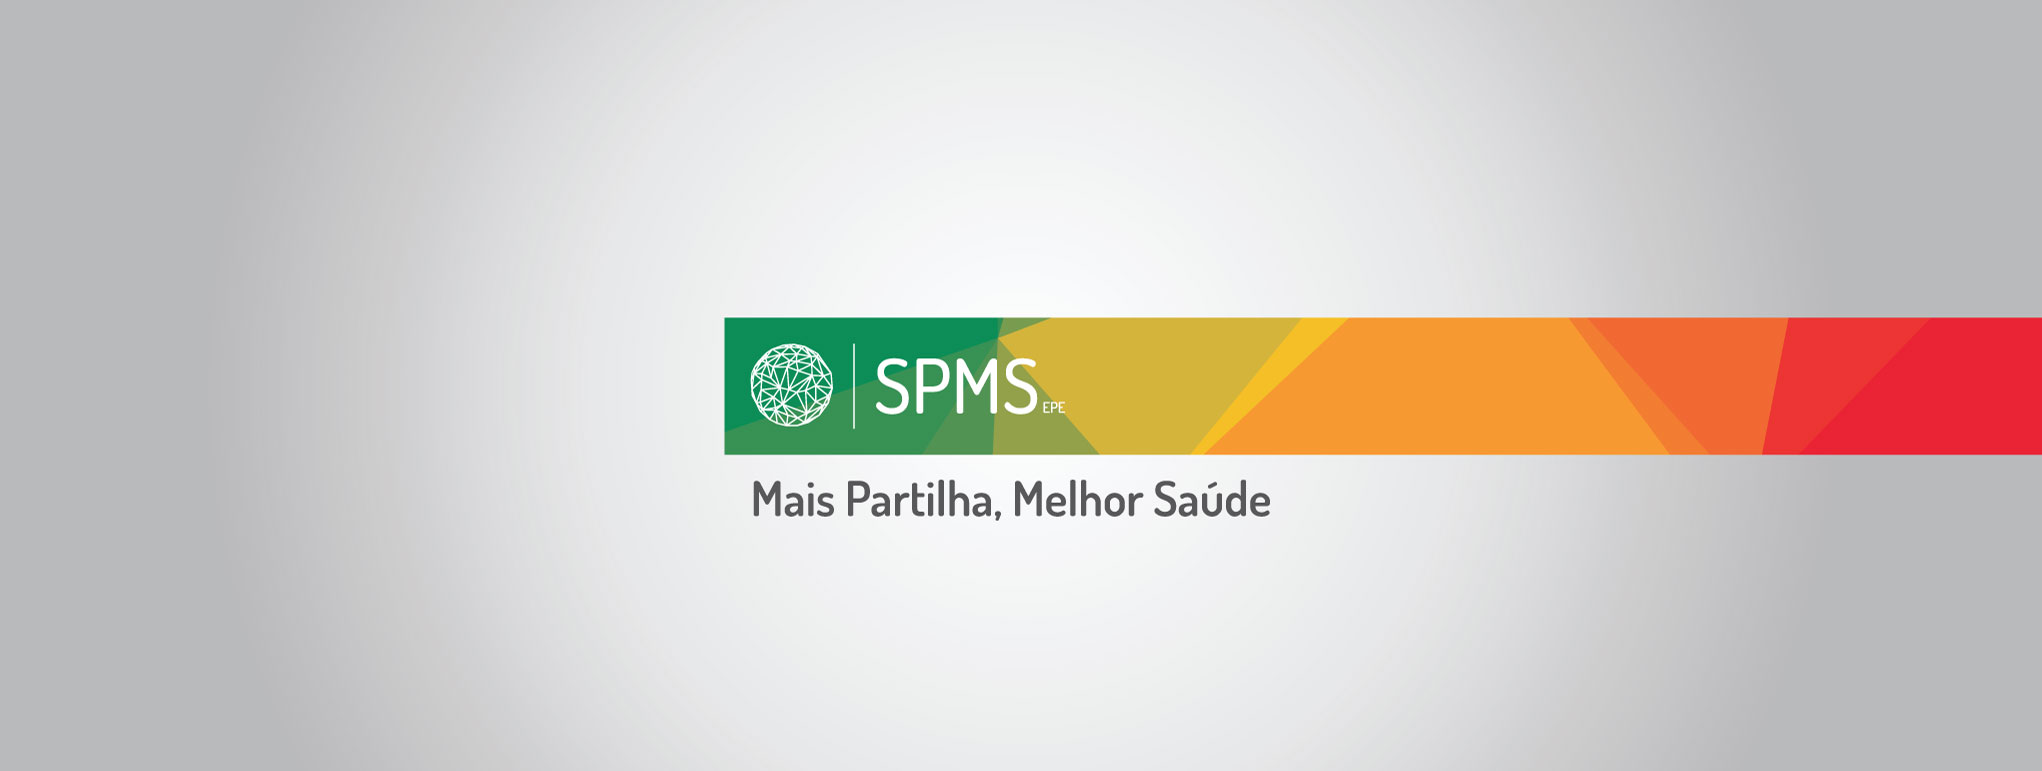 banner_spms7